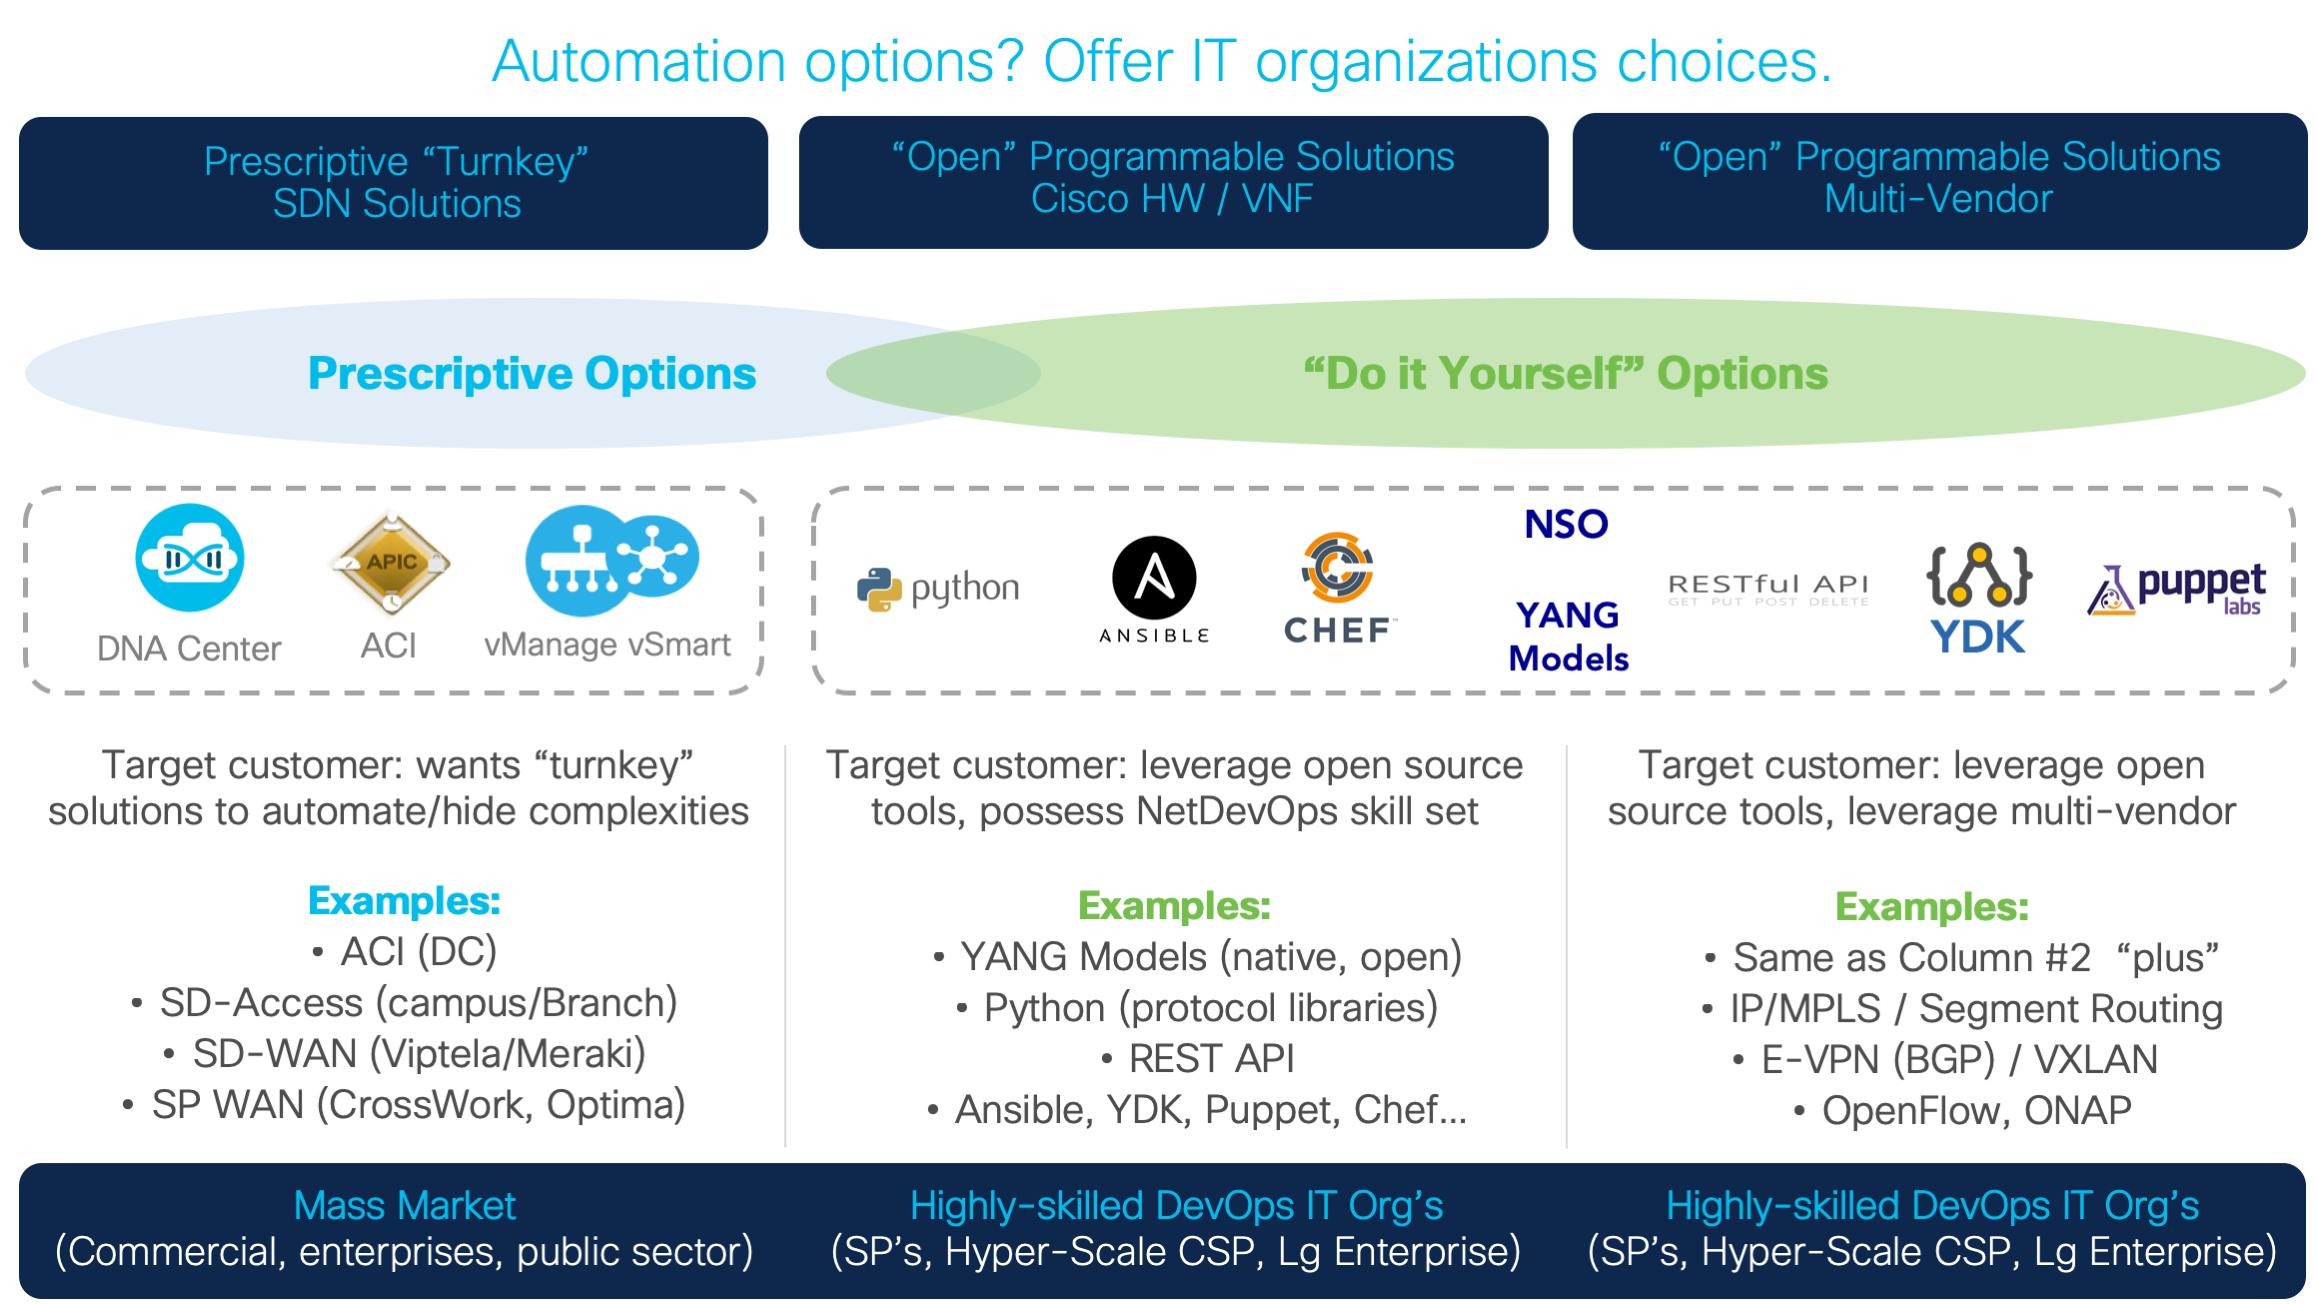 Network automation and programability